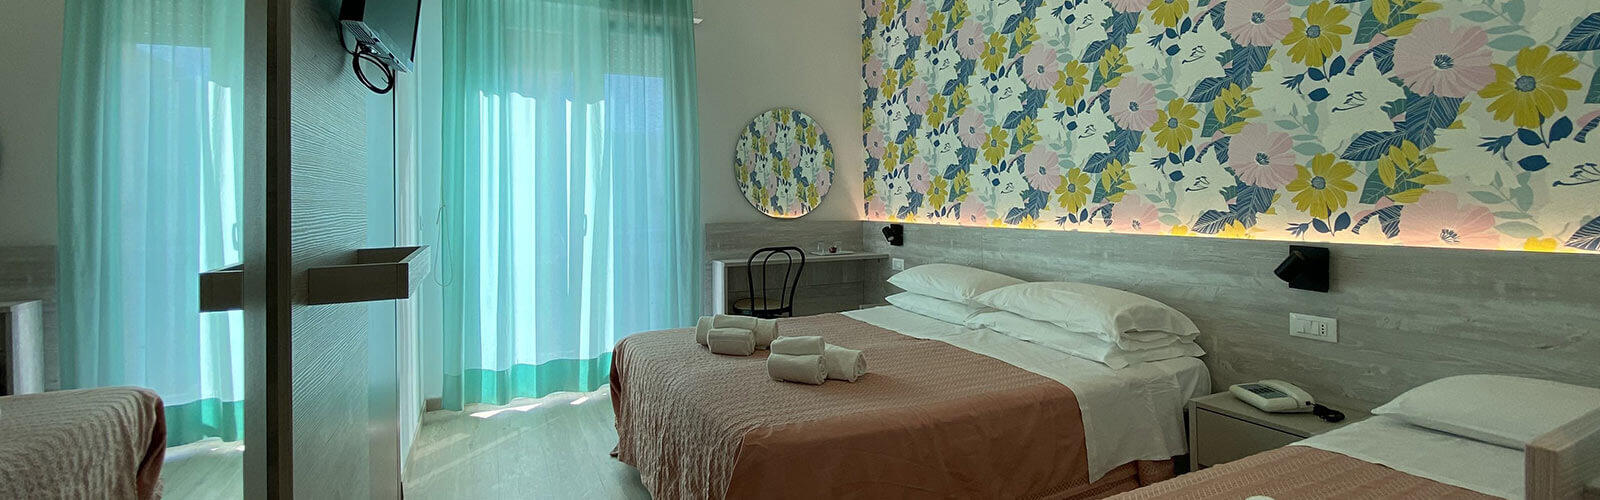 hotellaninfea it la-dependance 002